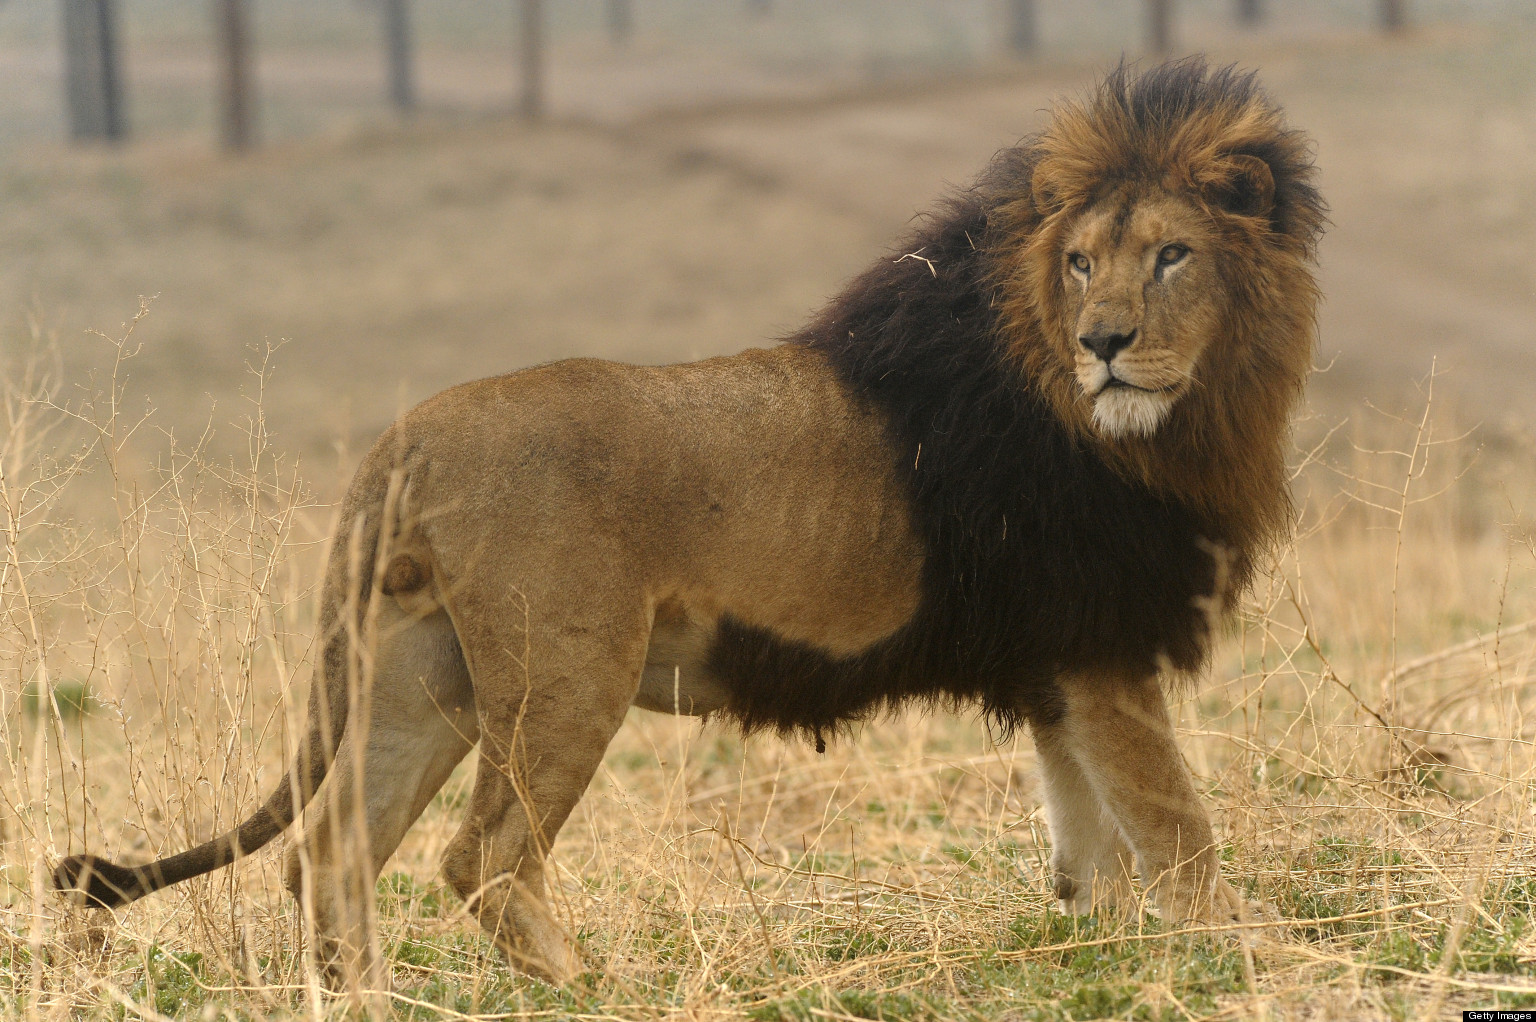 Beautiful Wallpaper Lion Facebook - o-LION-ARK-facebook  Image_477316.jpg